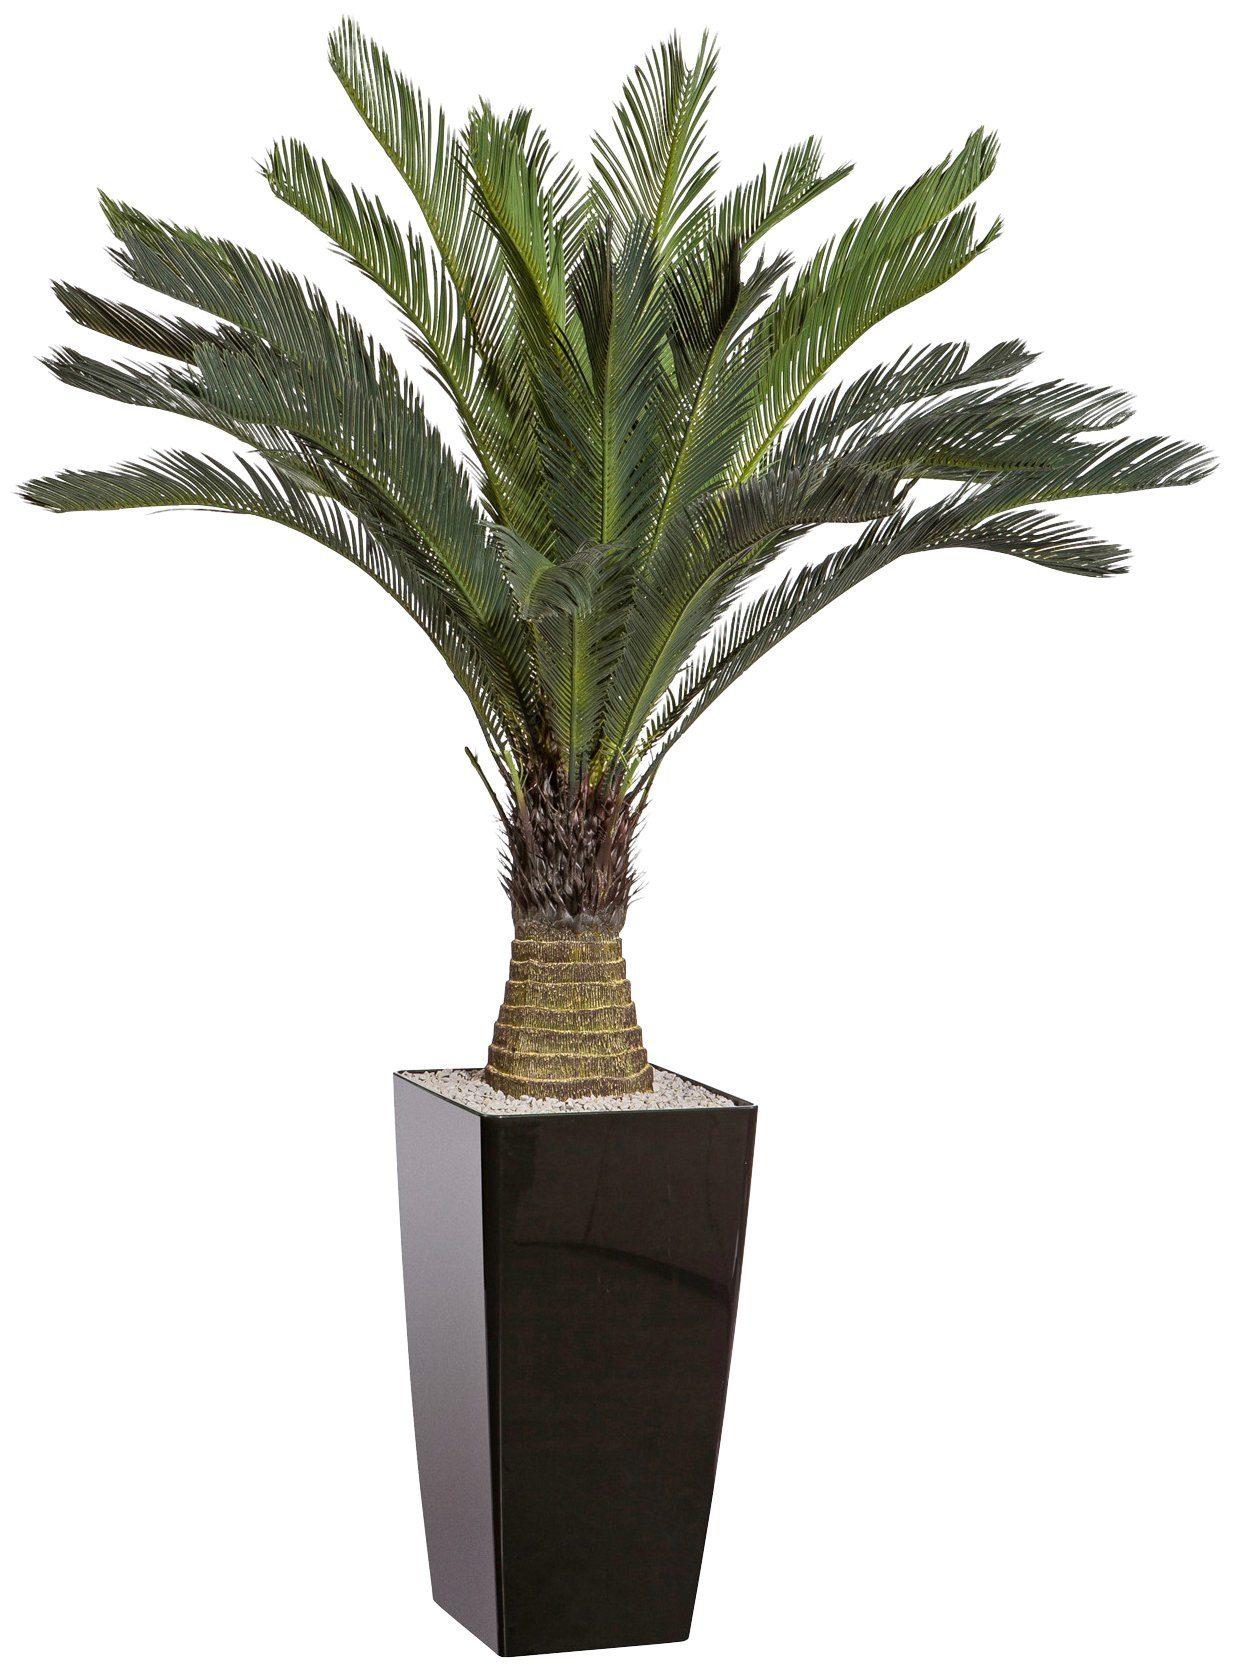 Kunstpflanze »Cycaspalme«, im Kunststofftopf, H: 130 cm